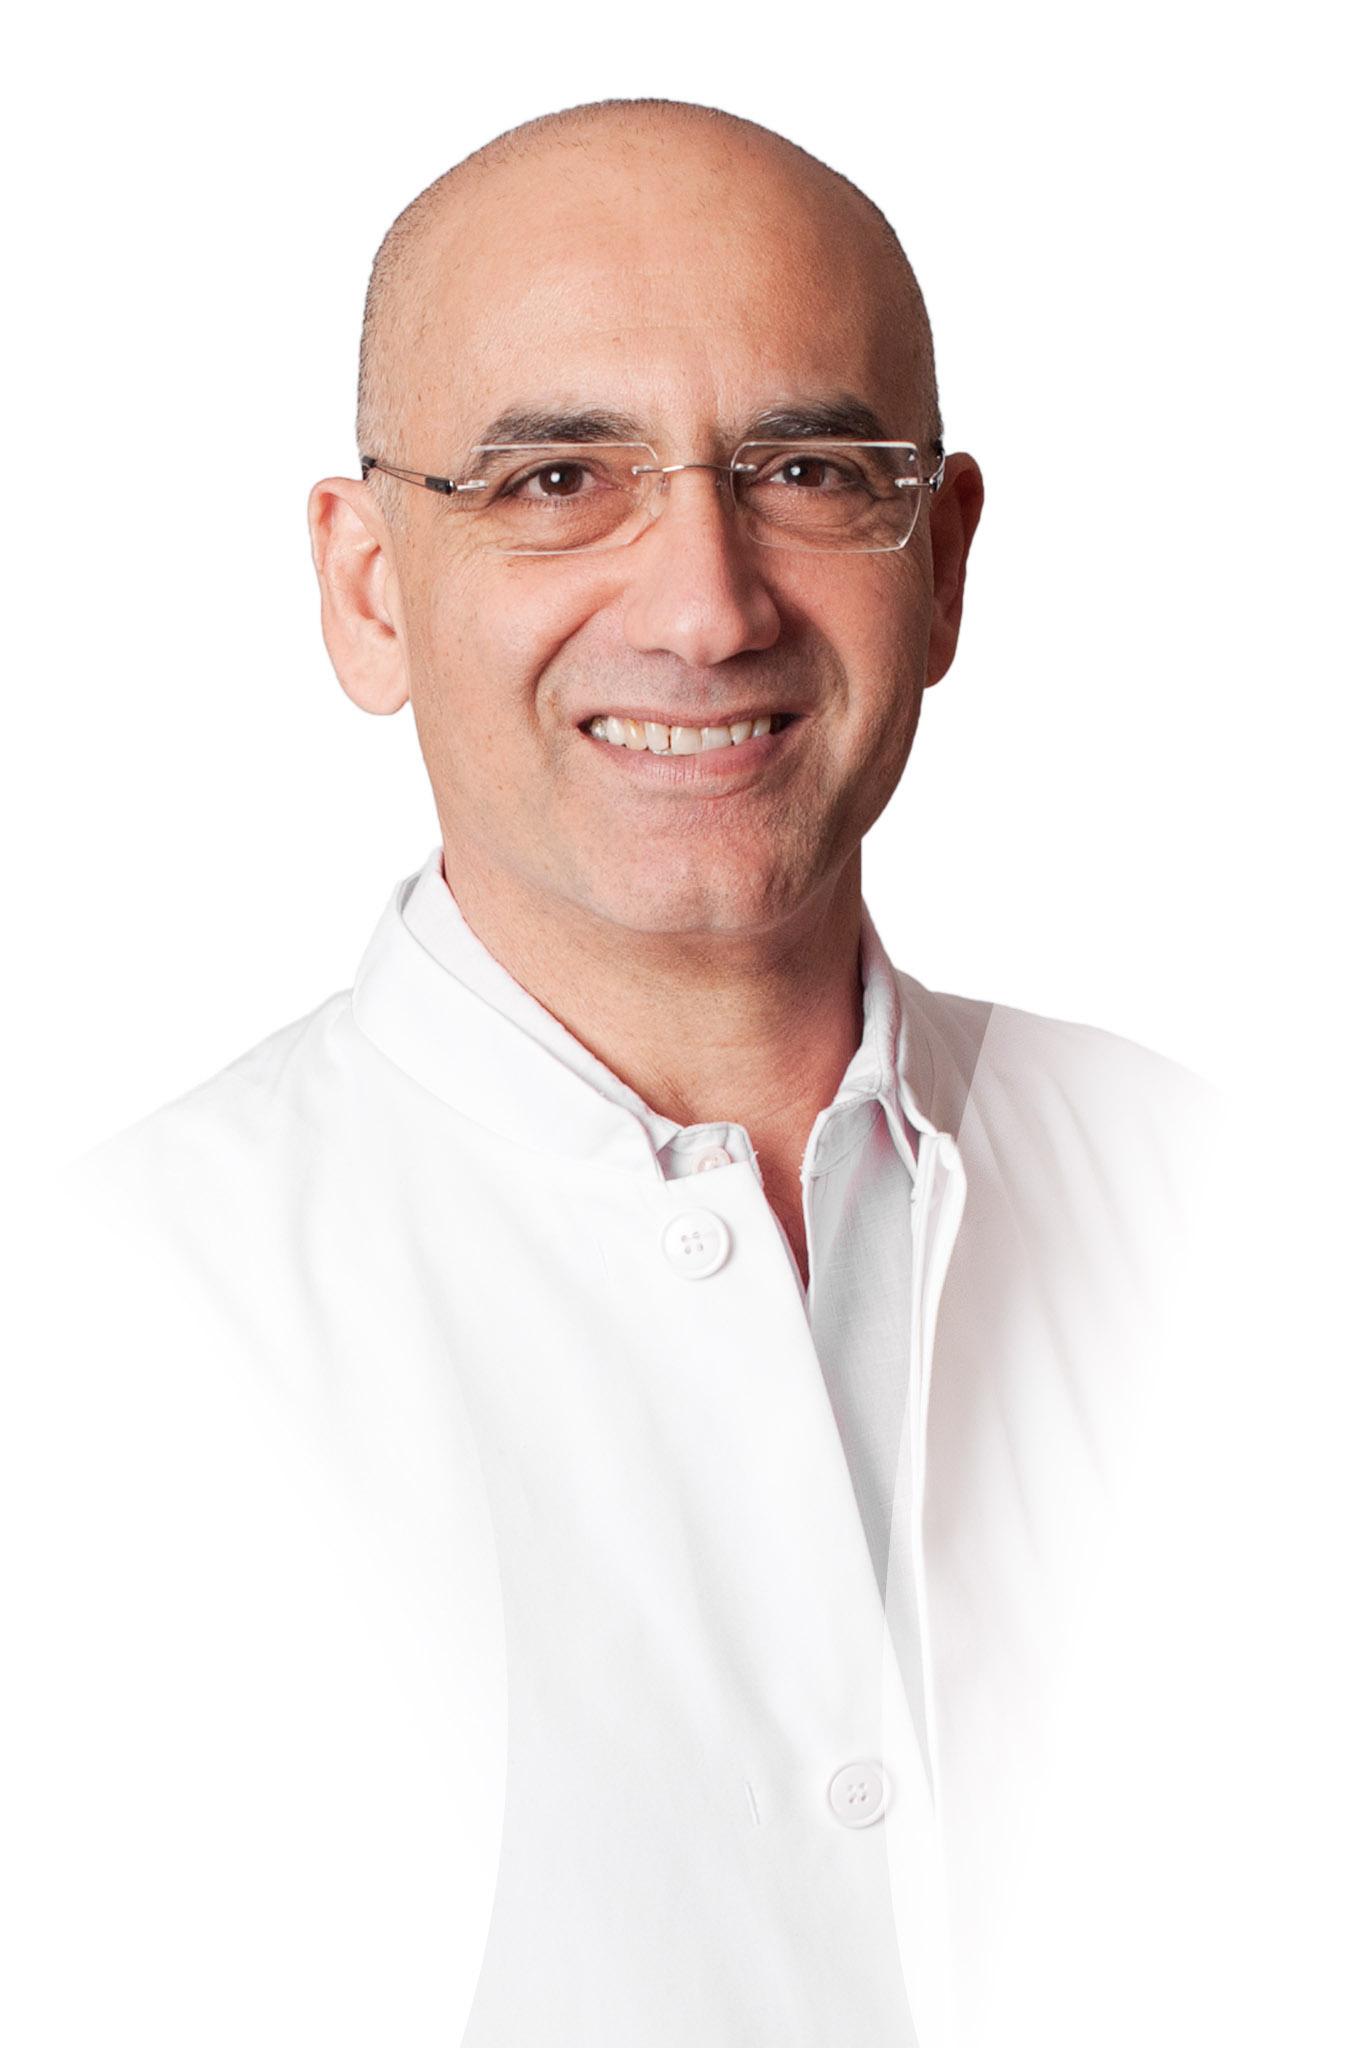 Gefäßdiagnostik und Gefäßtherapie   Dr. Gerard Mertikian